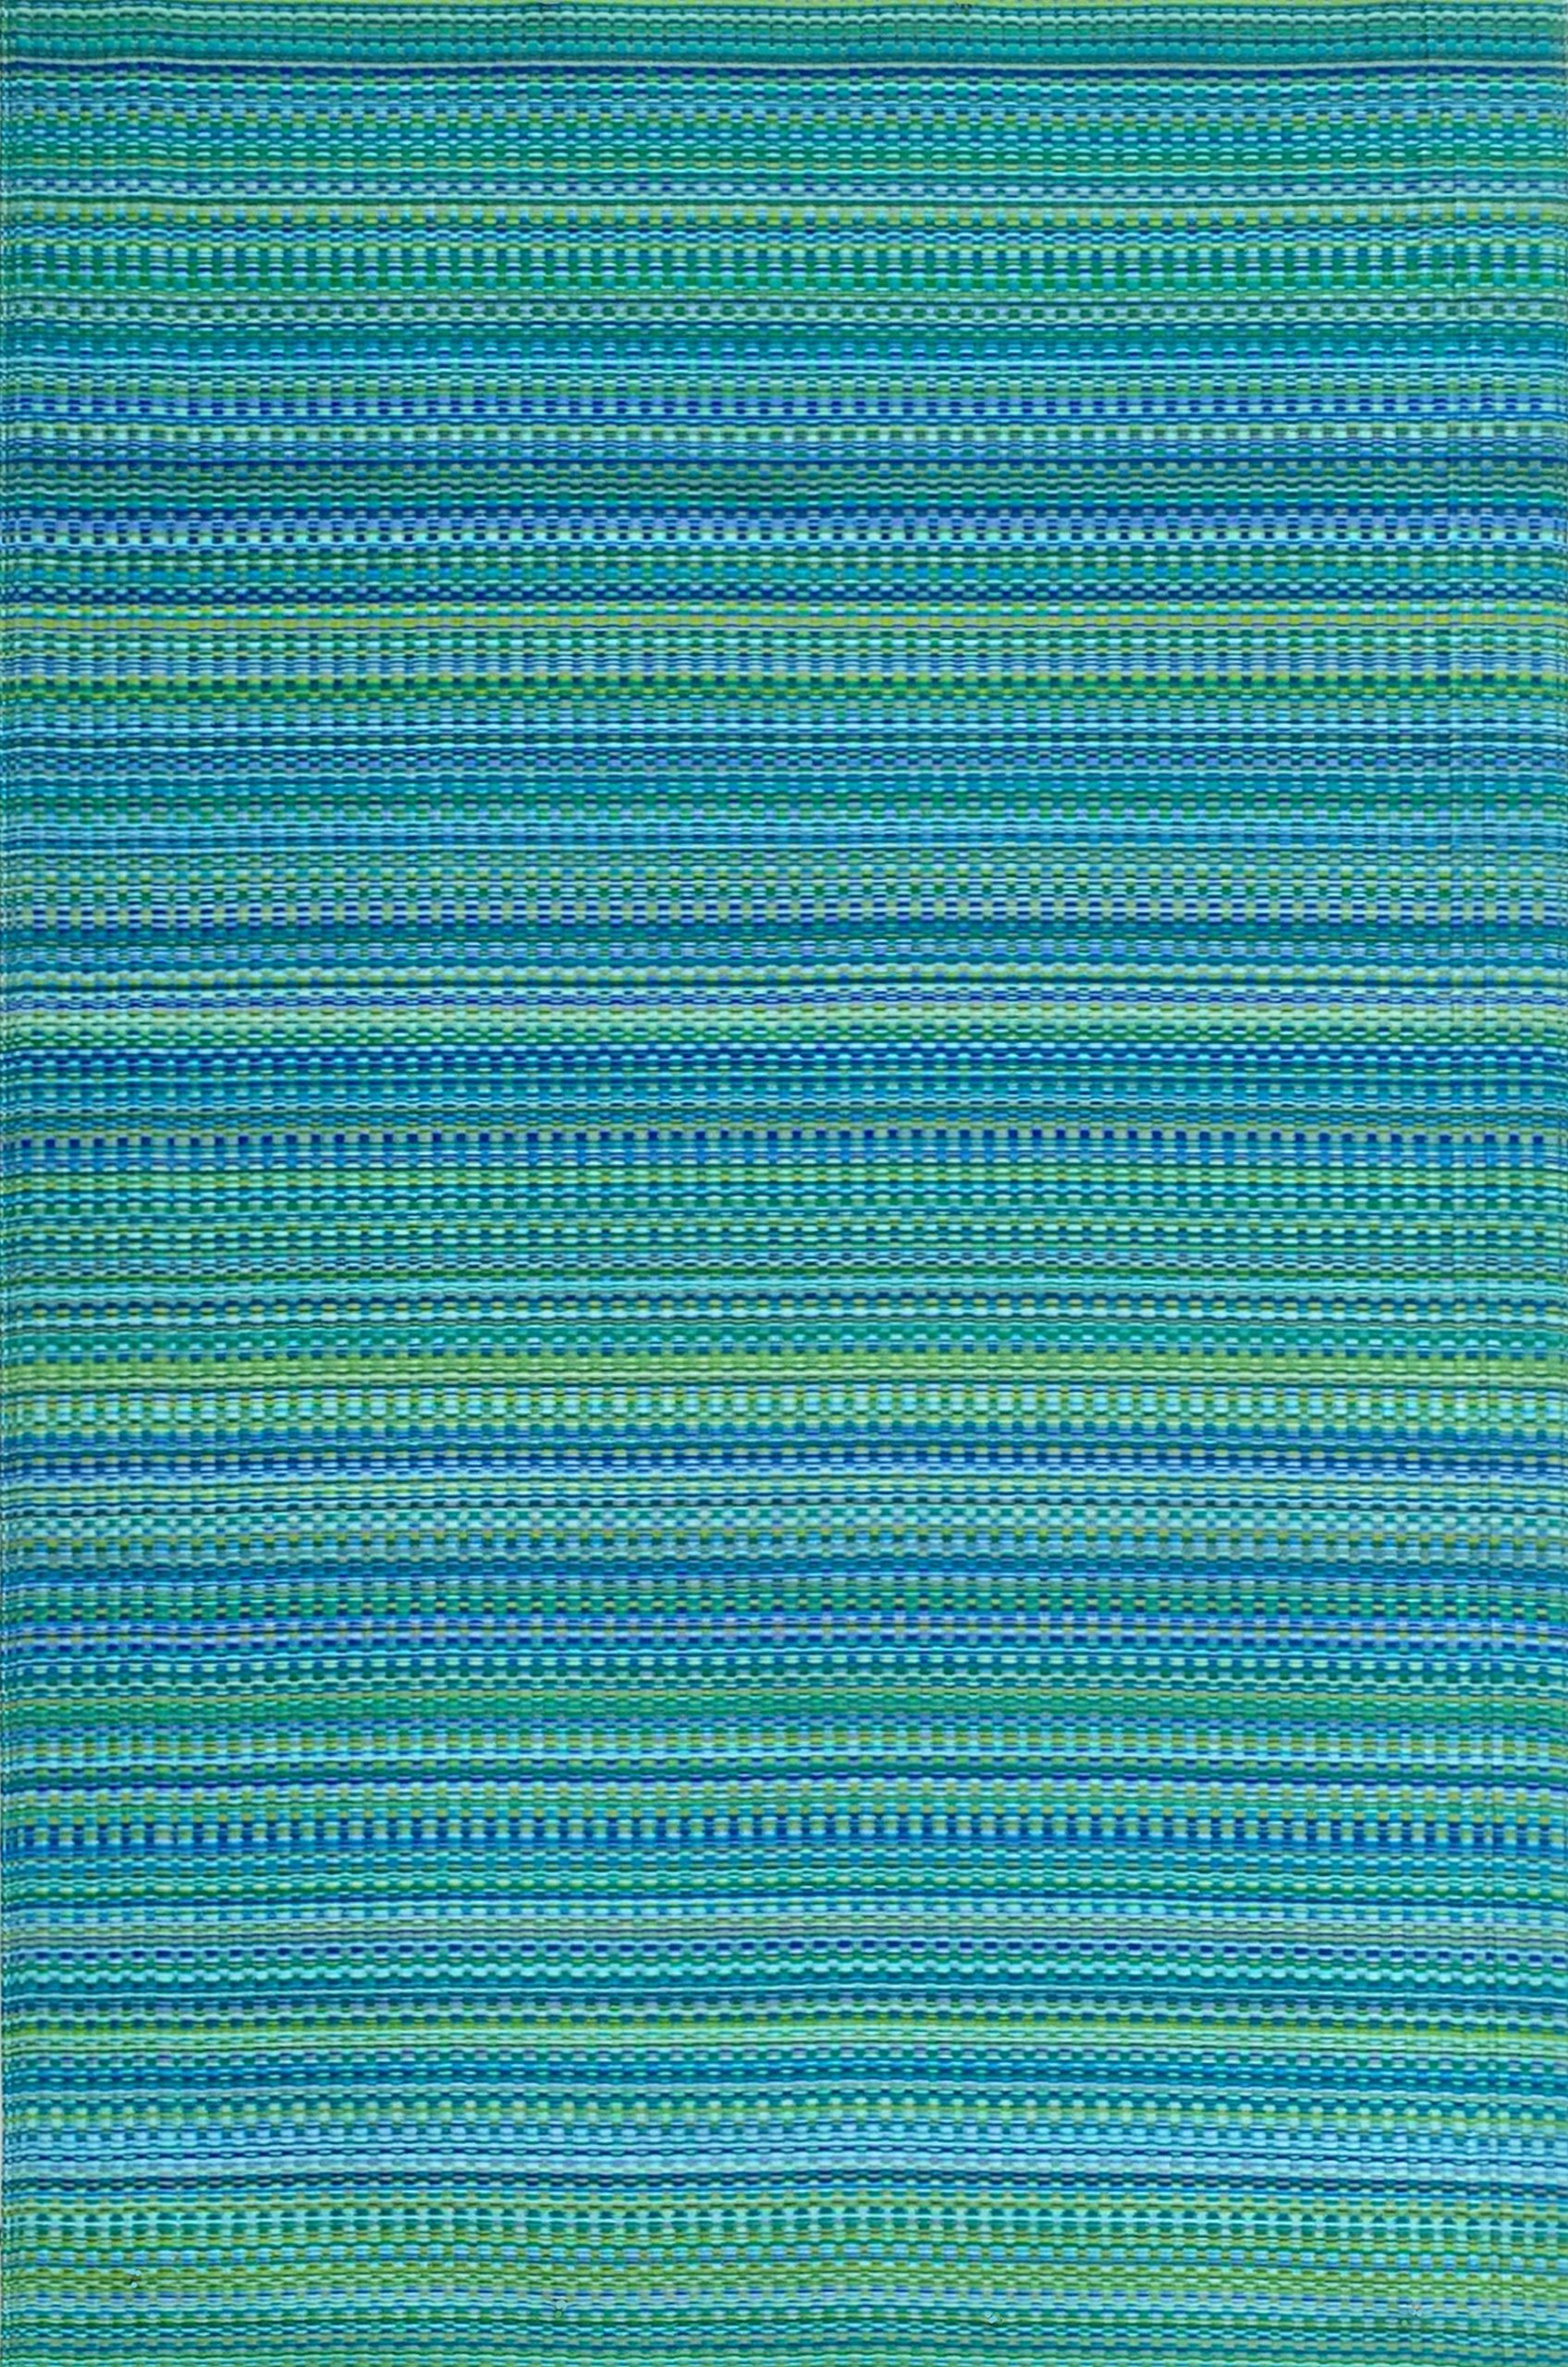 Mad Mats Mixed Indoor/Outdoor Floor Mat, 6 x 9 Feet , Tropical